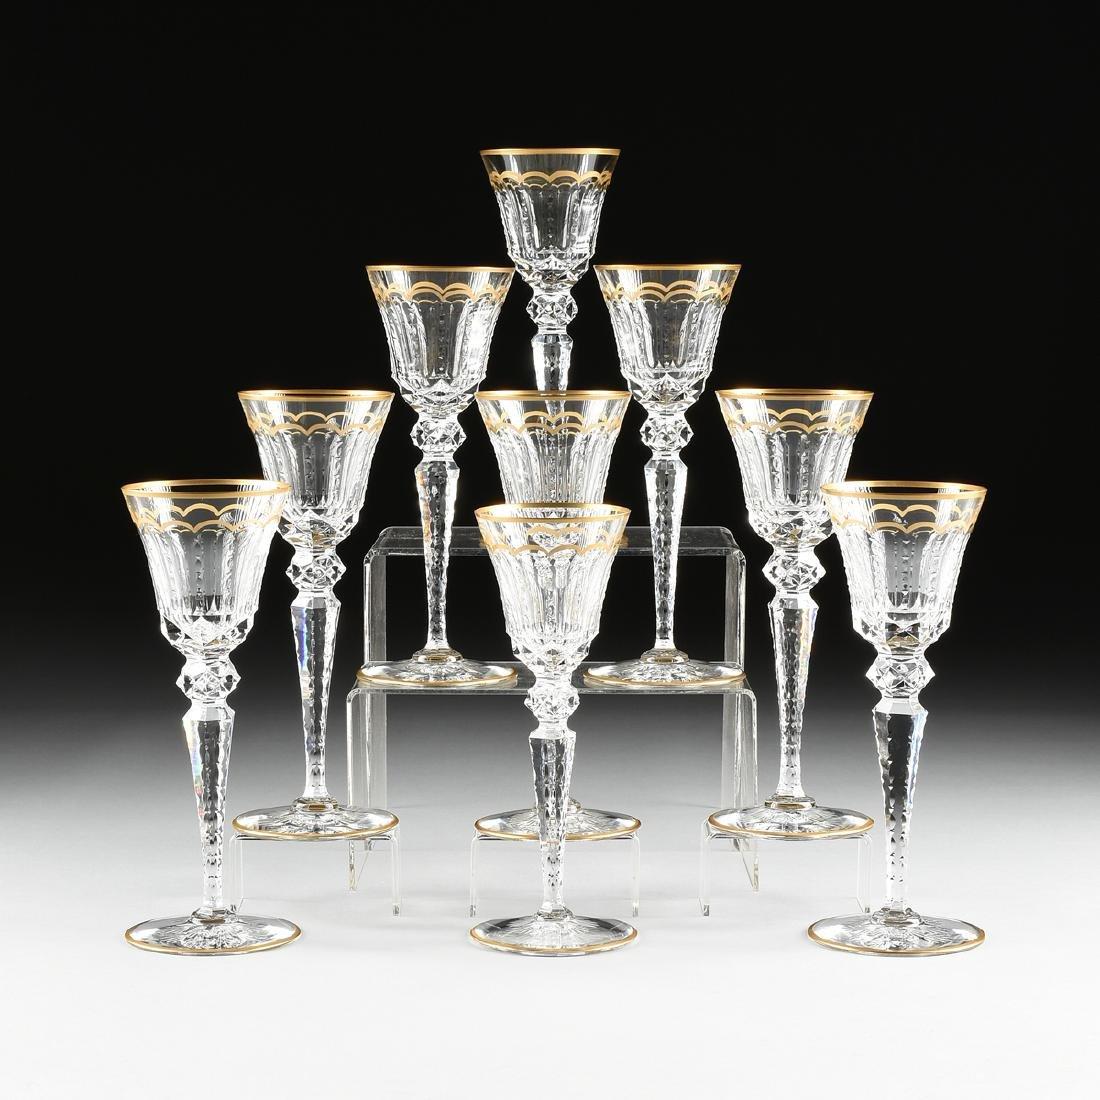 A SET OF NINE SAINT LOUIS CUT CRYSTAL WATER GLASSES IN